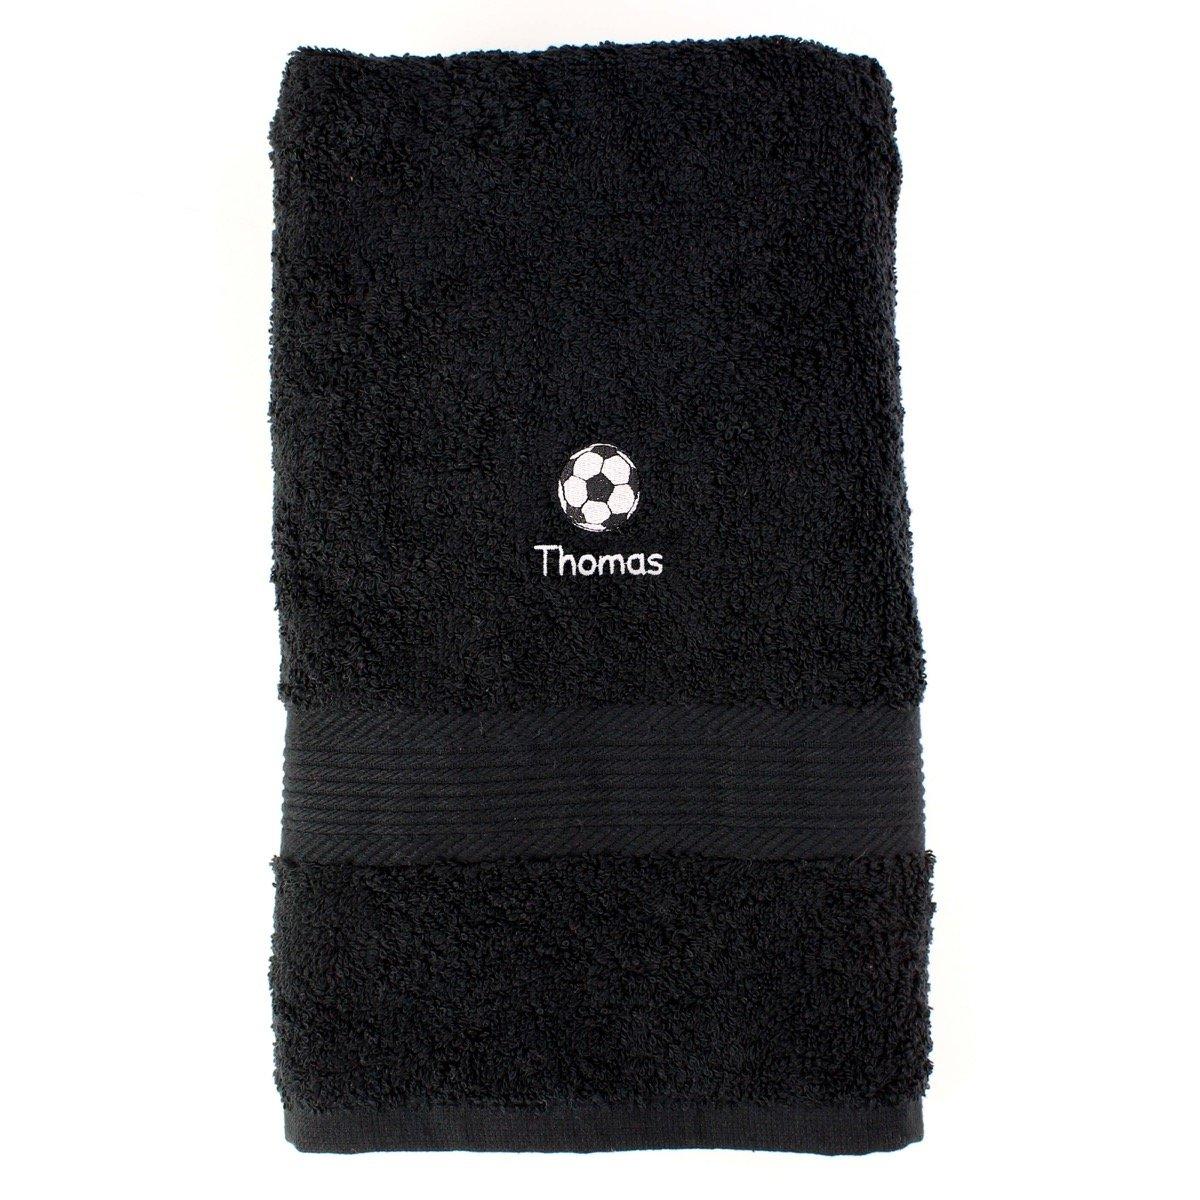 Personalised Football Black Hand Towel